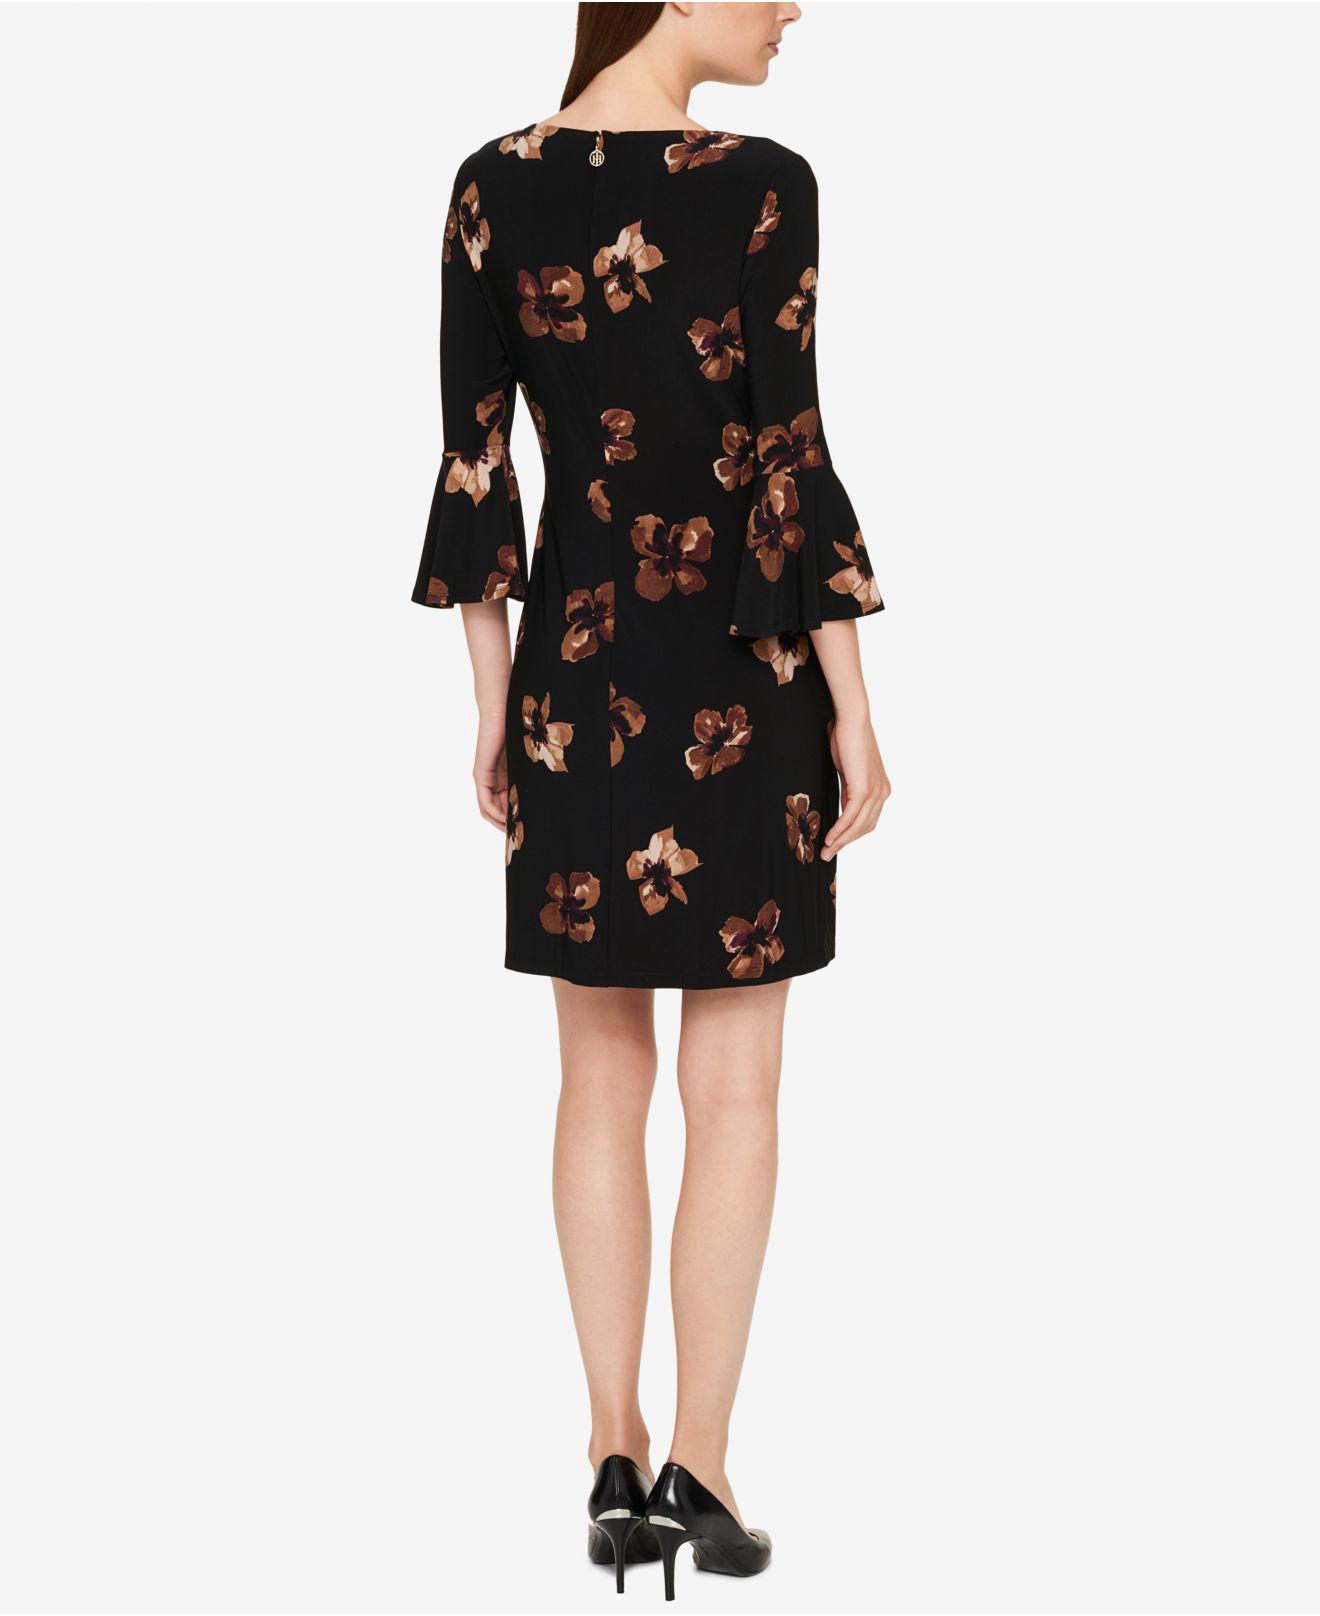 191d68b6b Lyst - Tommy Hilfiger Printed Bell-sleeve Dress in Black